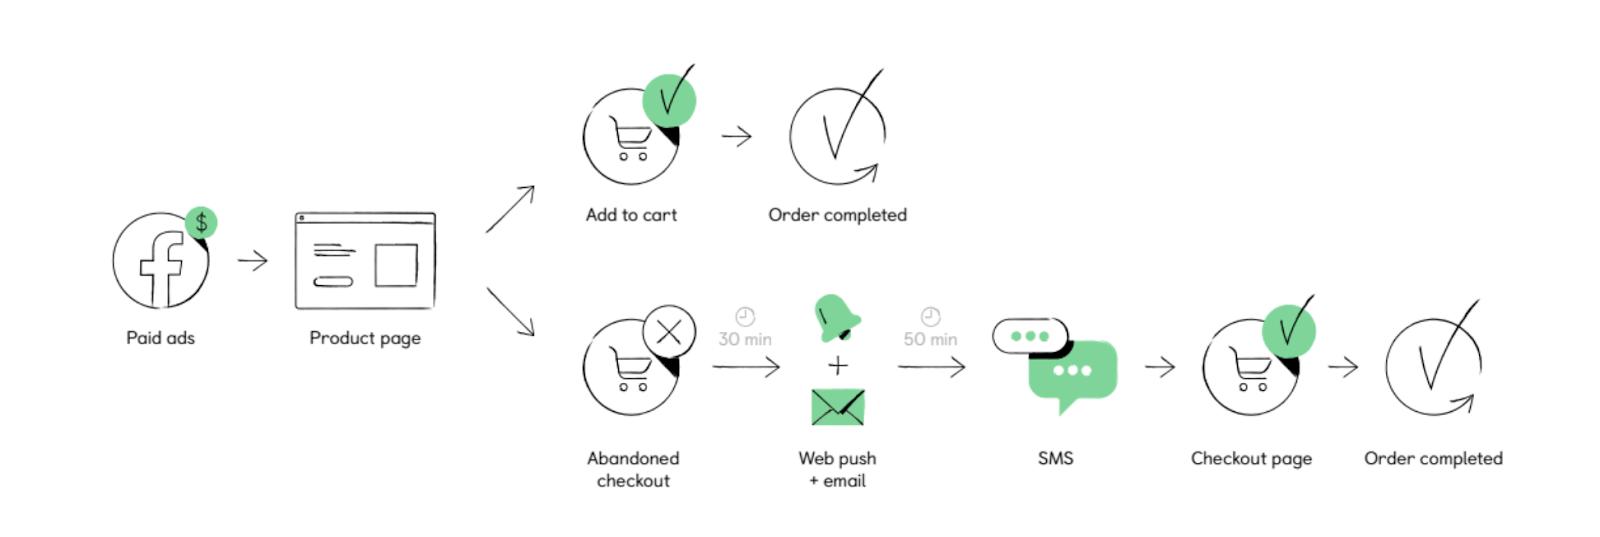 Omnichannel flow, customer re-targeting explanation